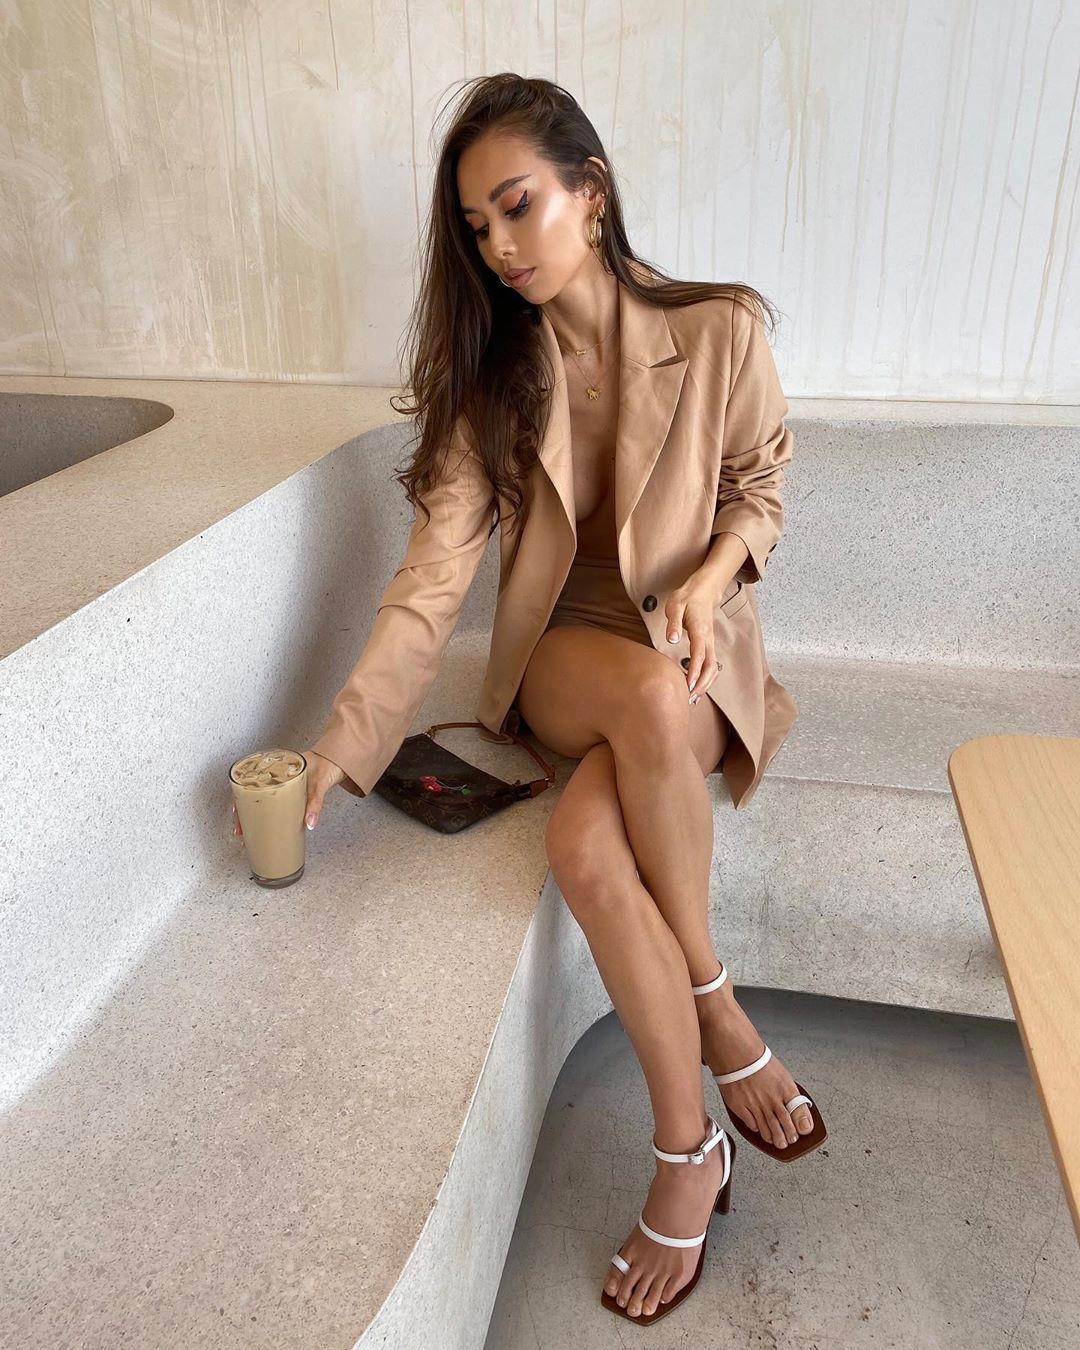 Model Chanel